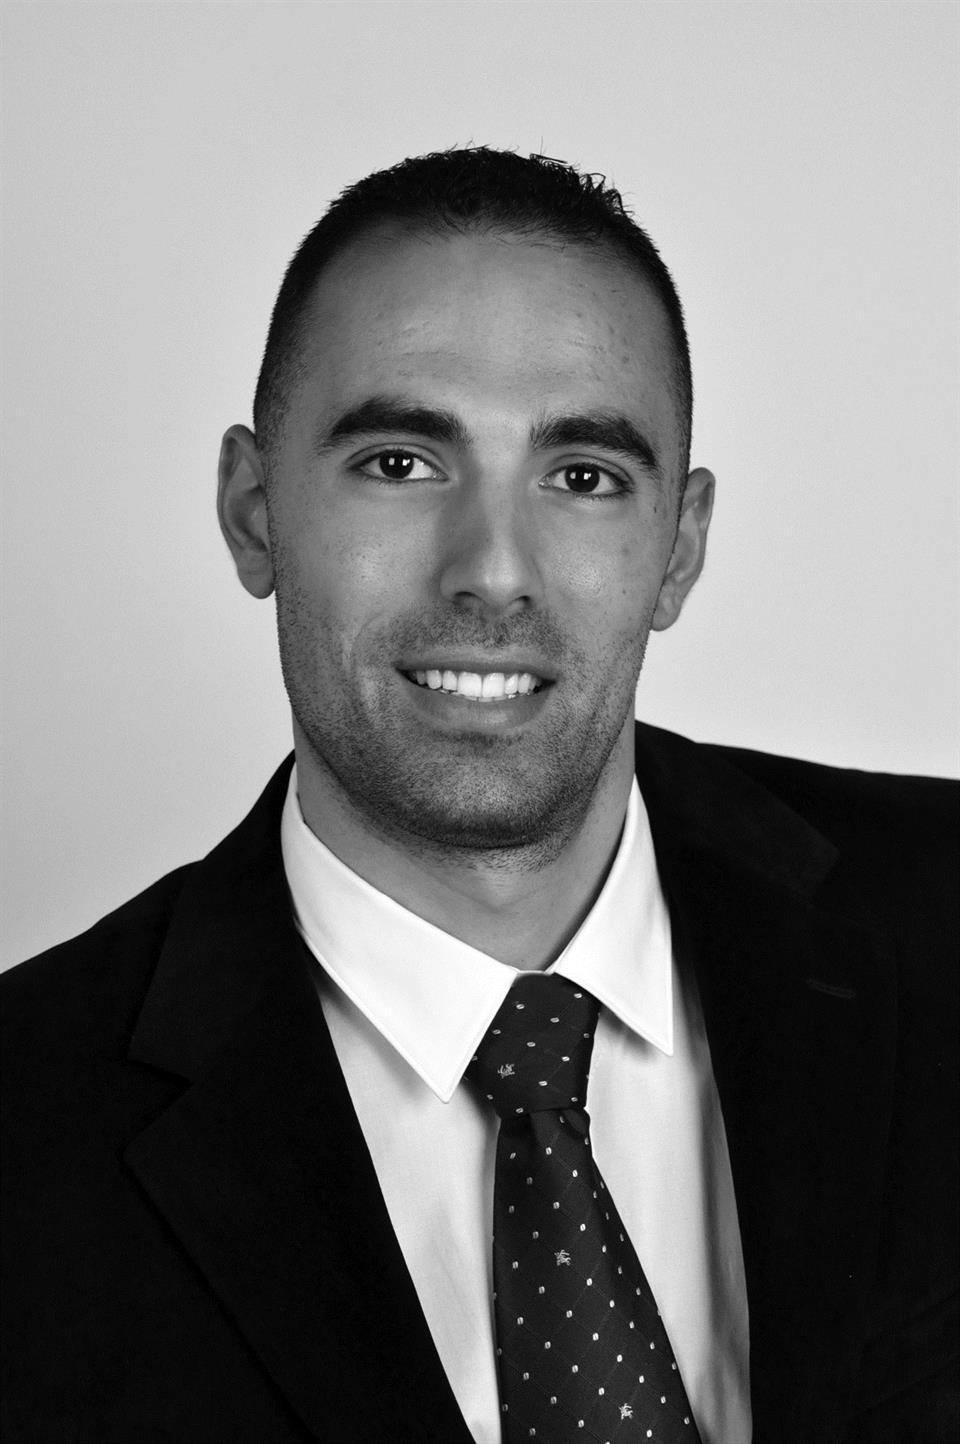 David Arustamian